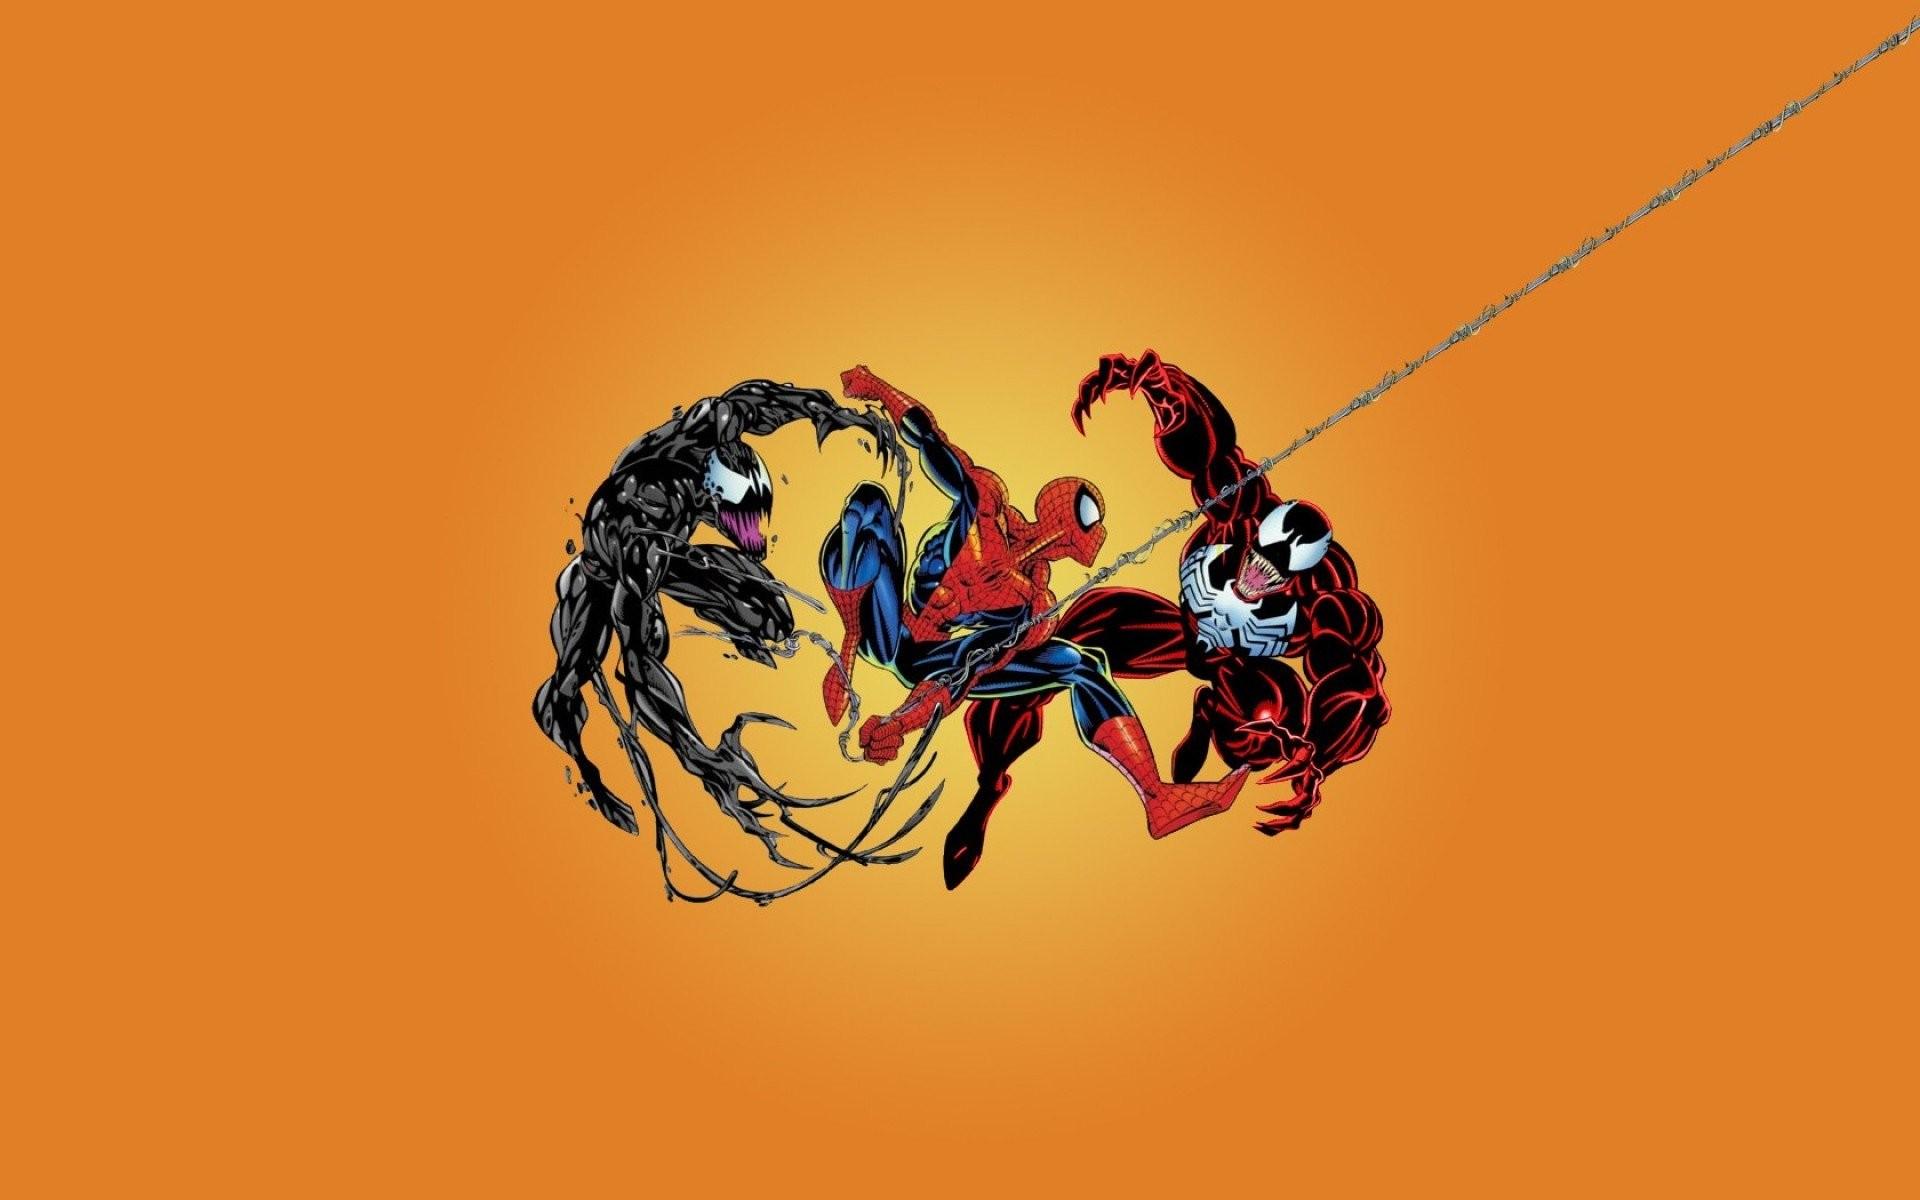 Black Spiderman Wallpapers – Wallpaper Cave   Adorable Wallpapers    Pinterest   Black spiderman, Spiderman and Wallpaper